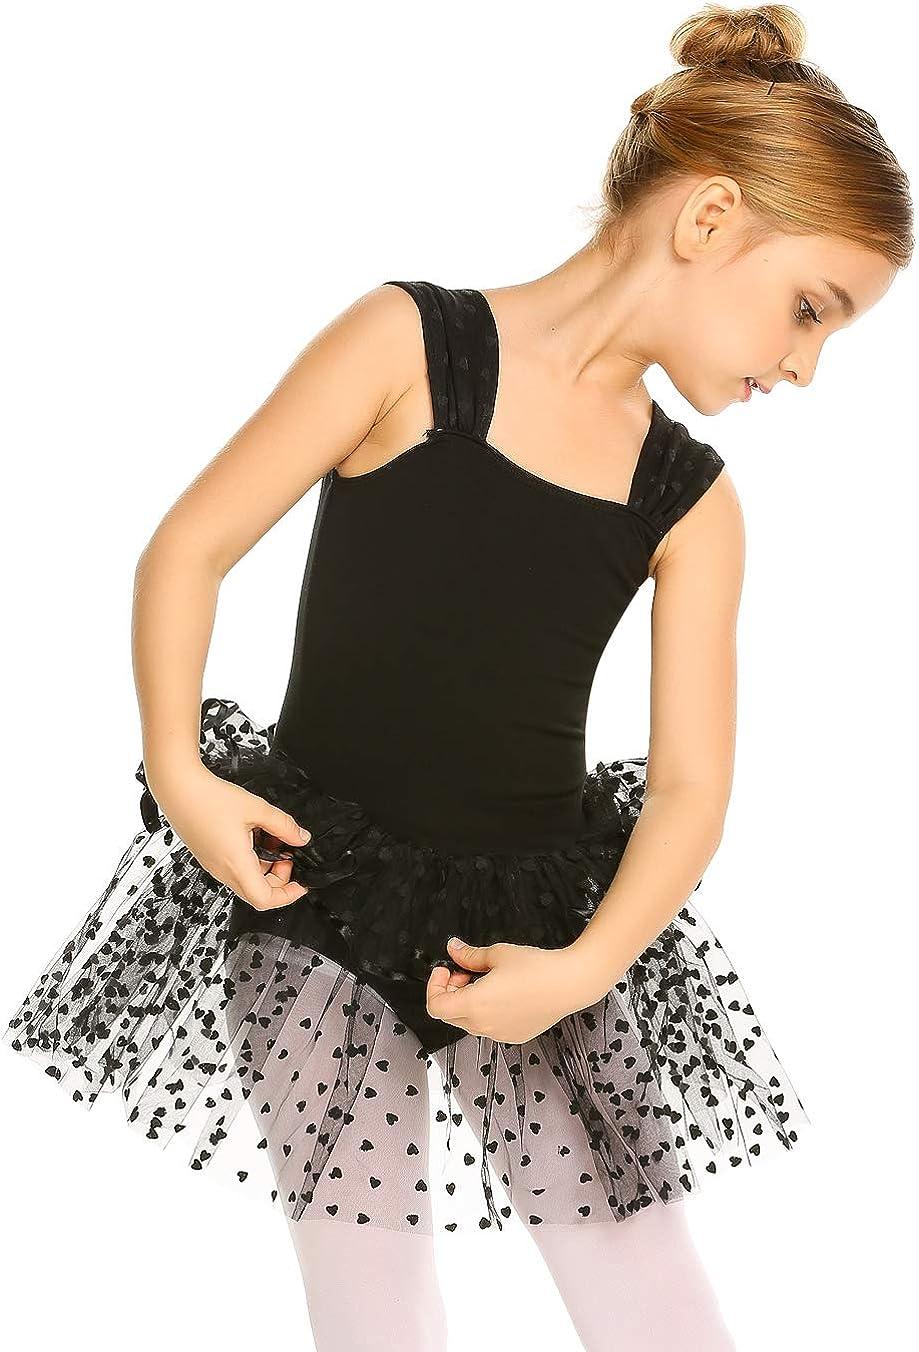 Zaclotre Girls Ballet Skirted Leotard with Chiffon Sequin Skirt Dance Dresses Short Sleeve